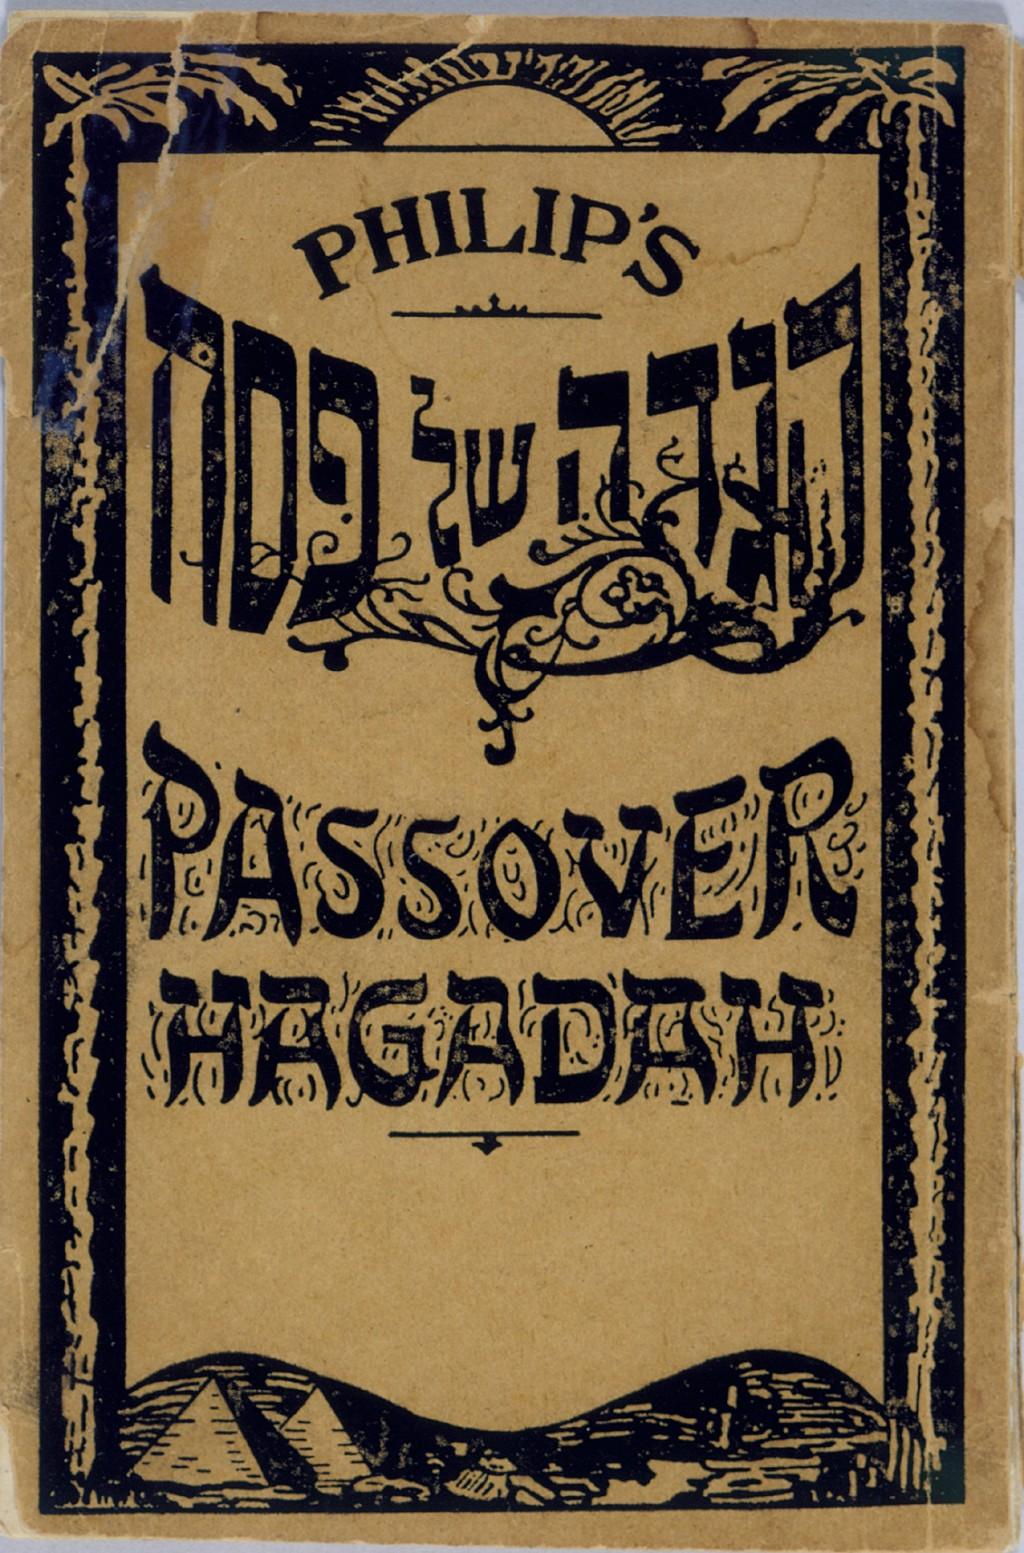 Passover Haggadah printed in Shanghai [LCID: 2002kwra]